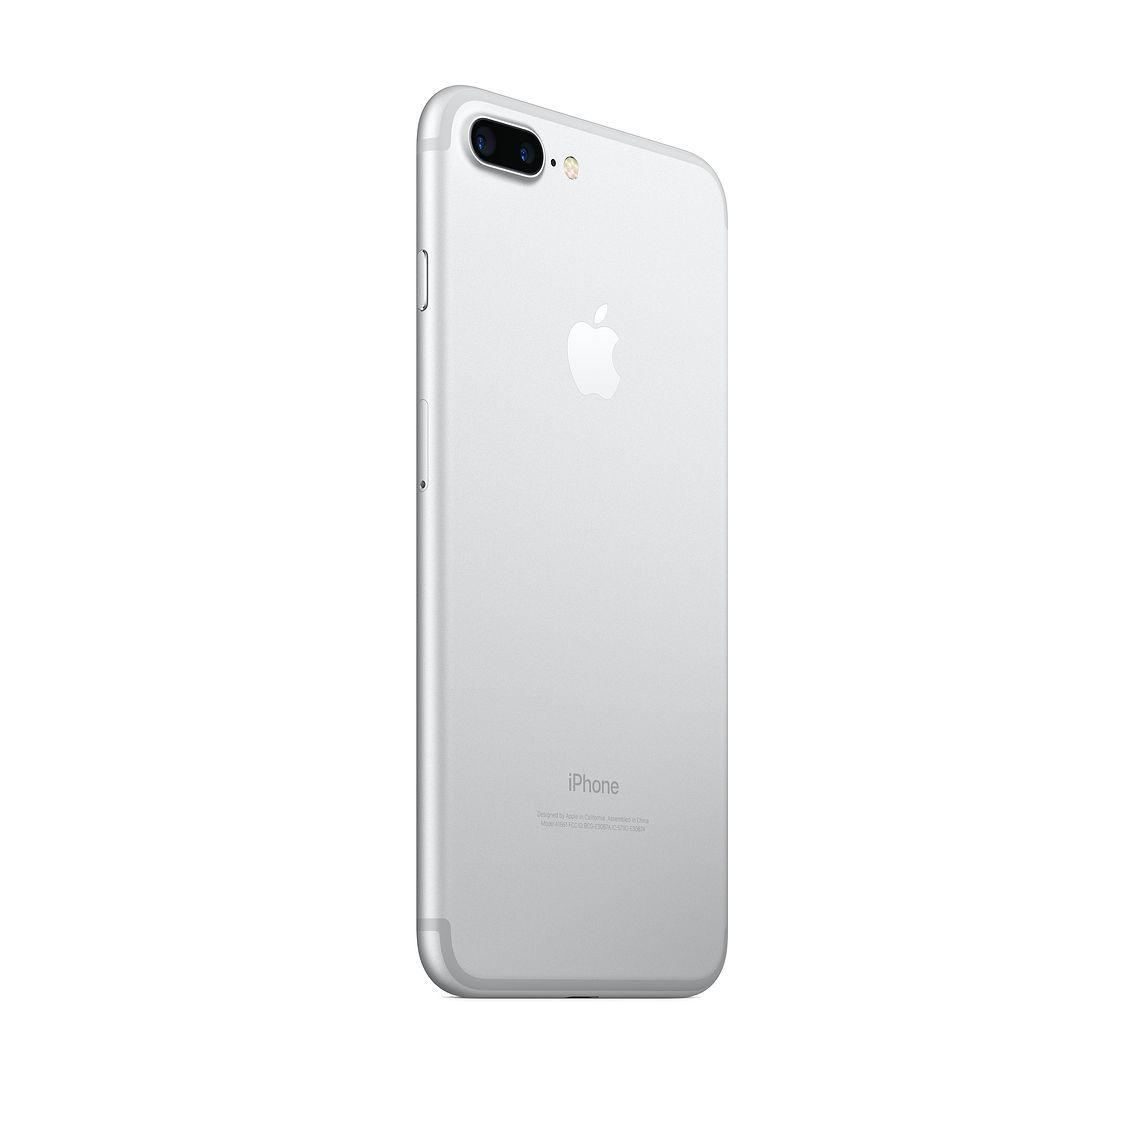 Refurbished Iphone 7 Plus 128gb Rose Gold Unlocked Apple Iphone 7 Plus Iphone Iphone 7